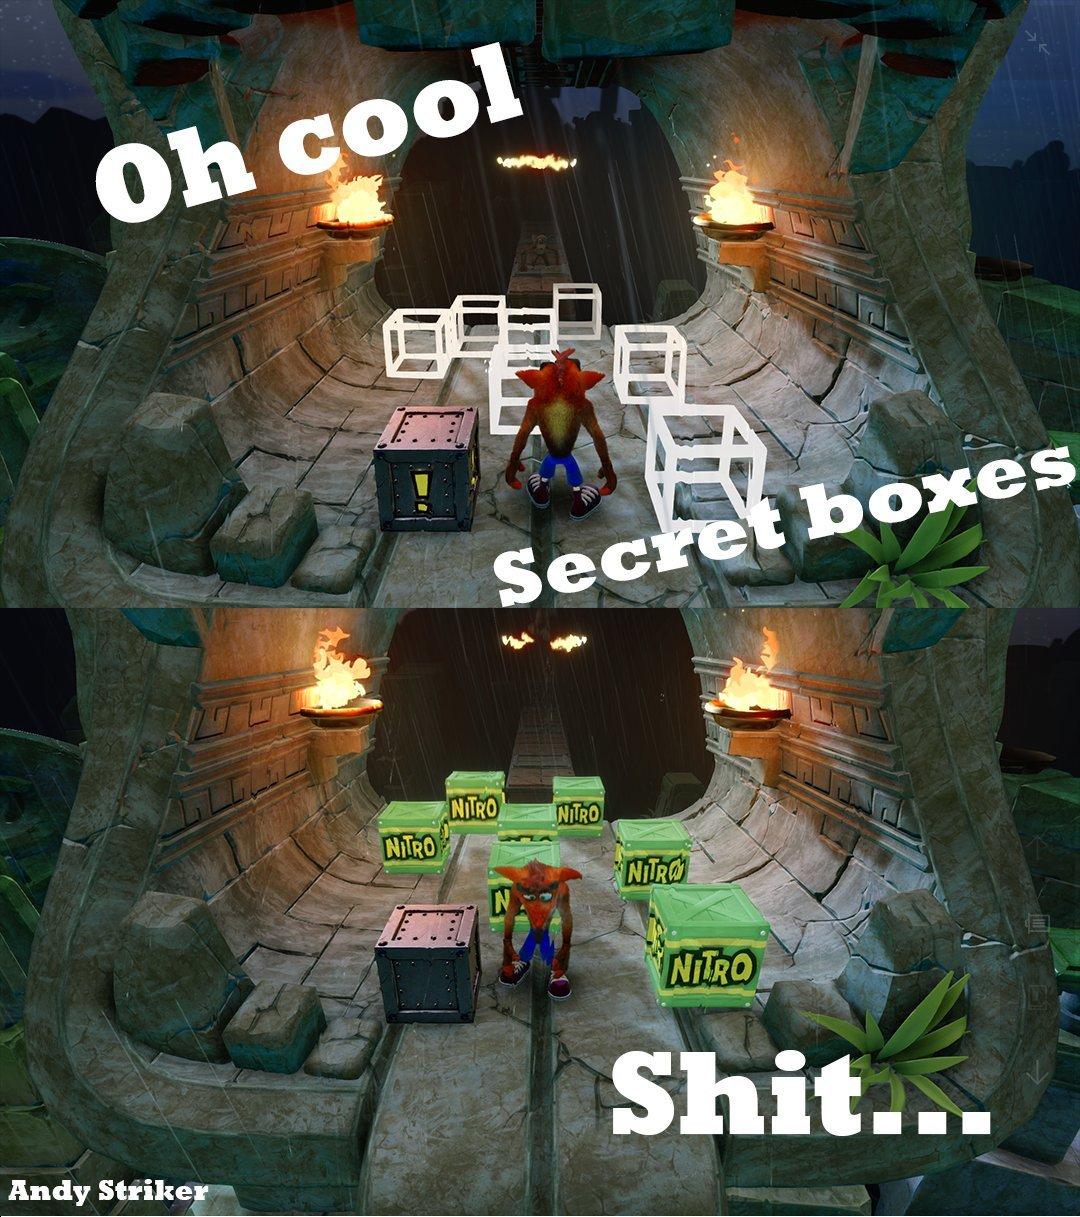 Oh crash (remastered) - meme